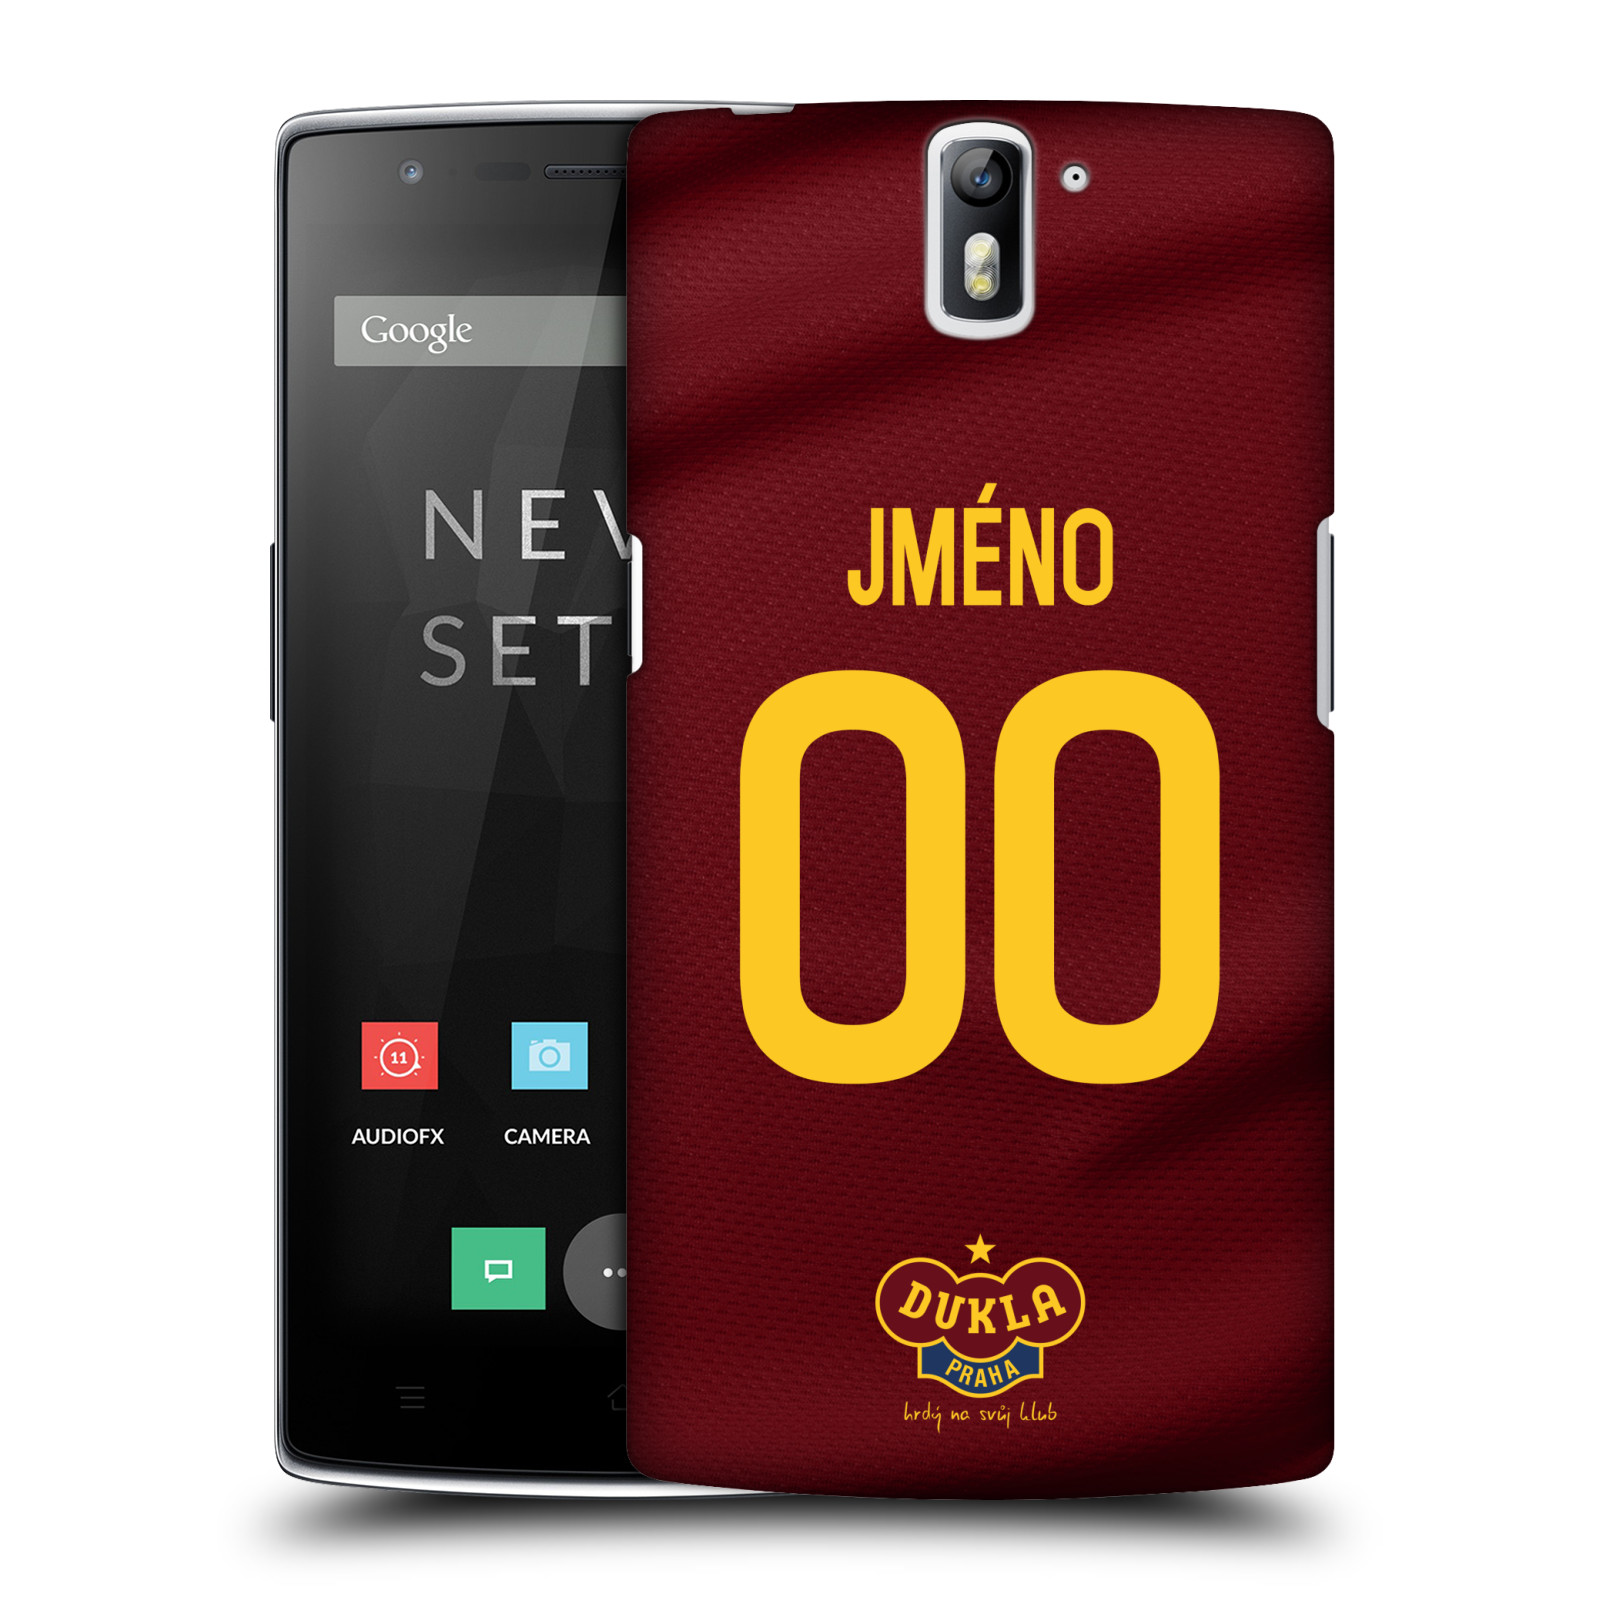 Plastové pouzdro na mobil OnePlus One - FK Dukla Praha - dres s vlastním jménem a číslem